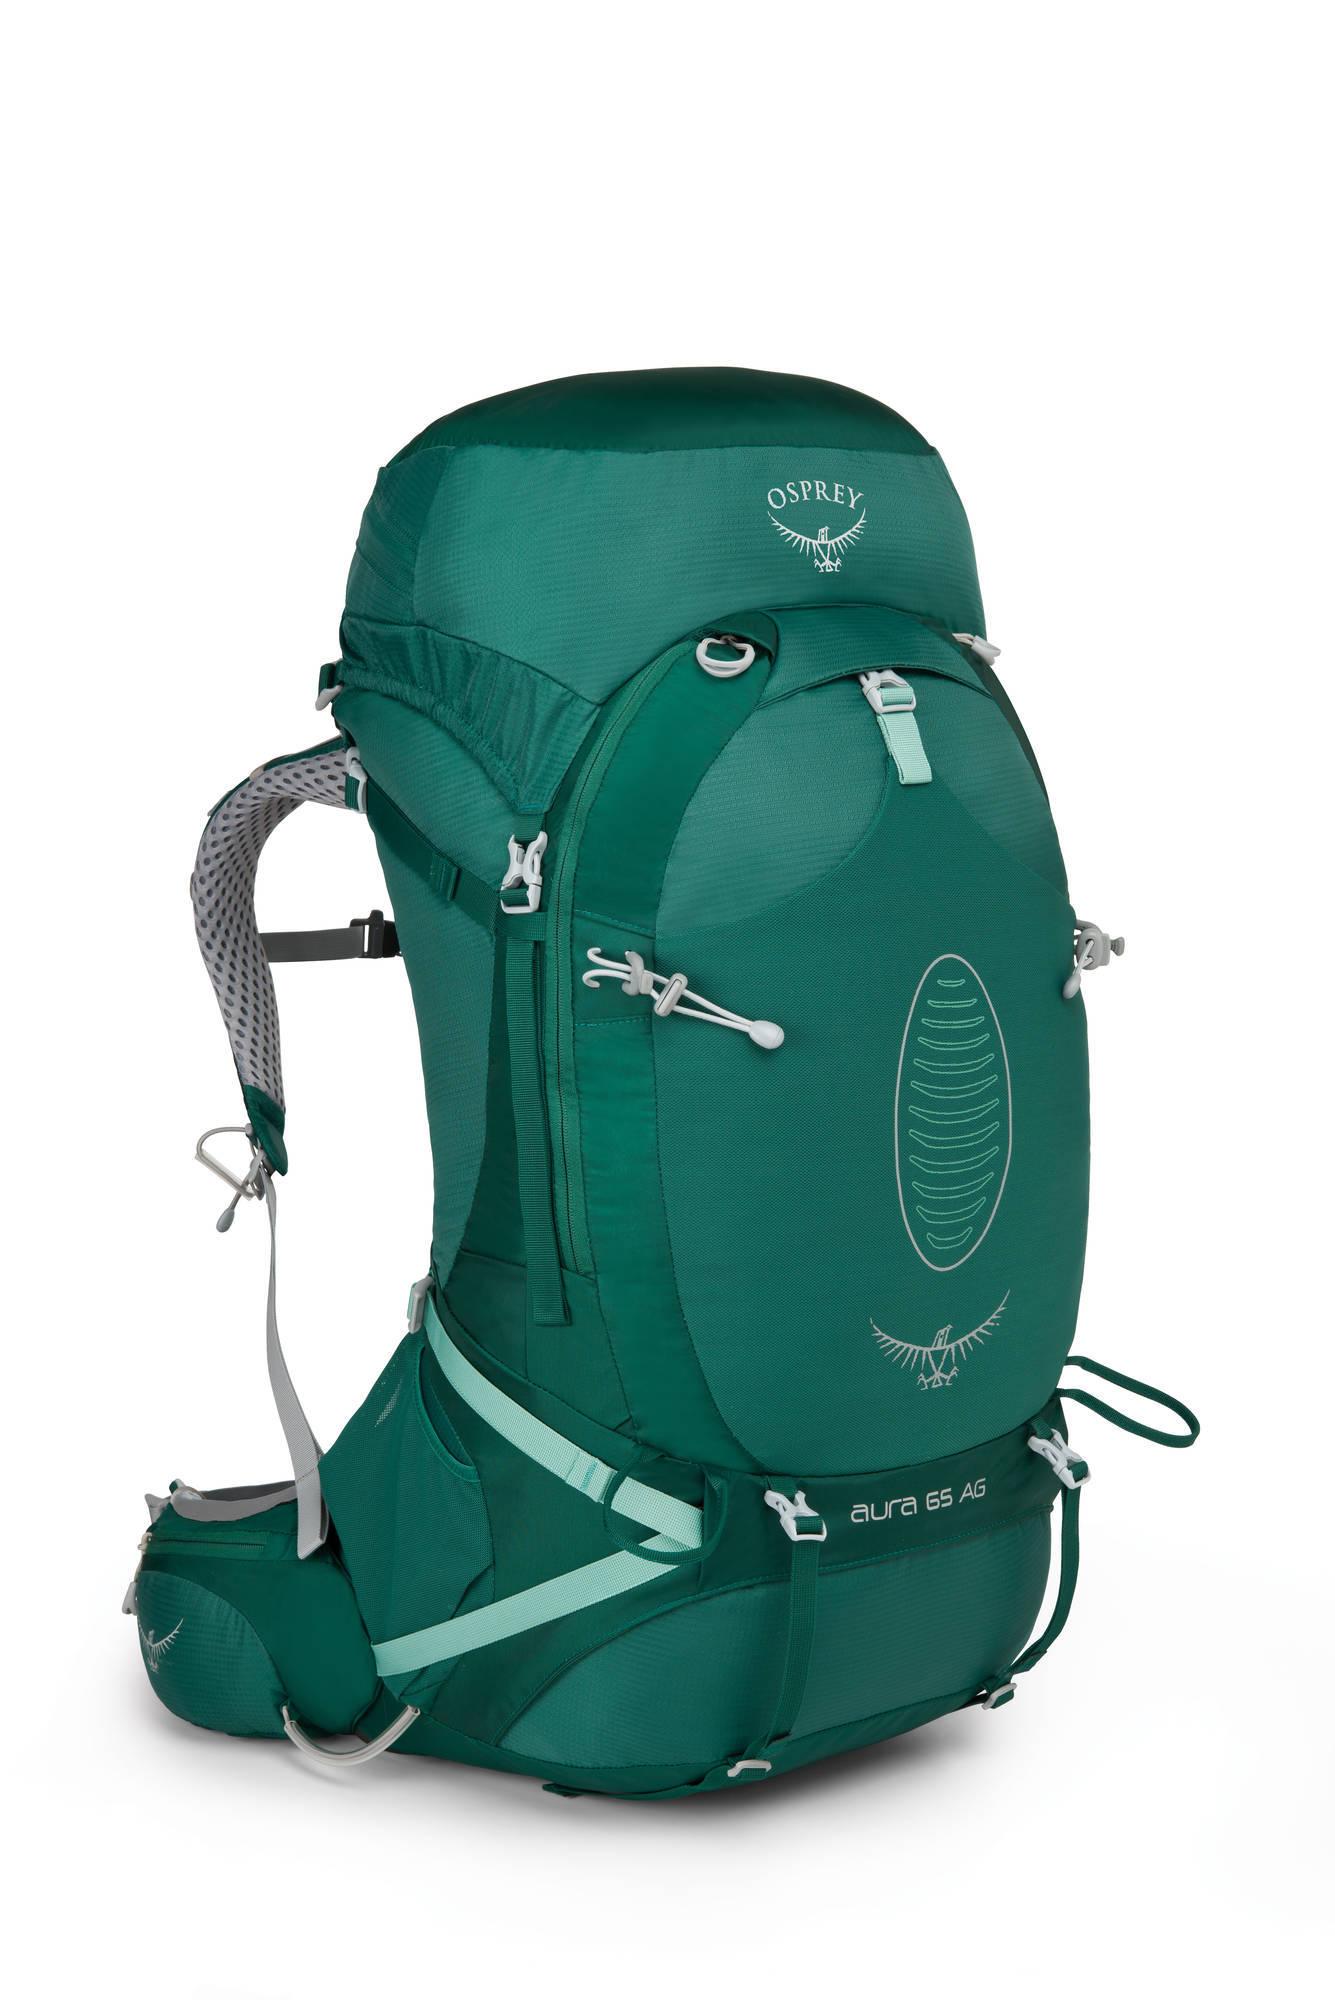 Туристические рюкзаки Рюкзак туристический женский Osprey Aura AG 65 Aura_AG_65_Side_Rainforest_Green_web.jpg